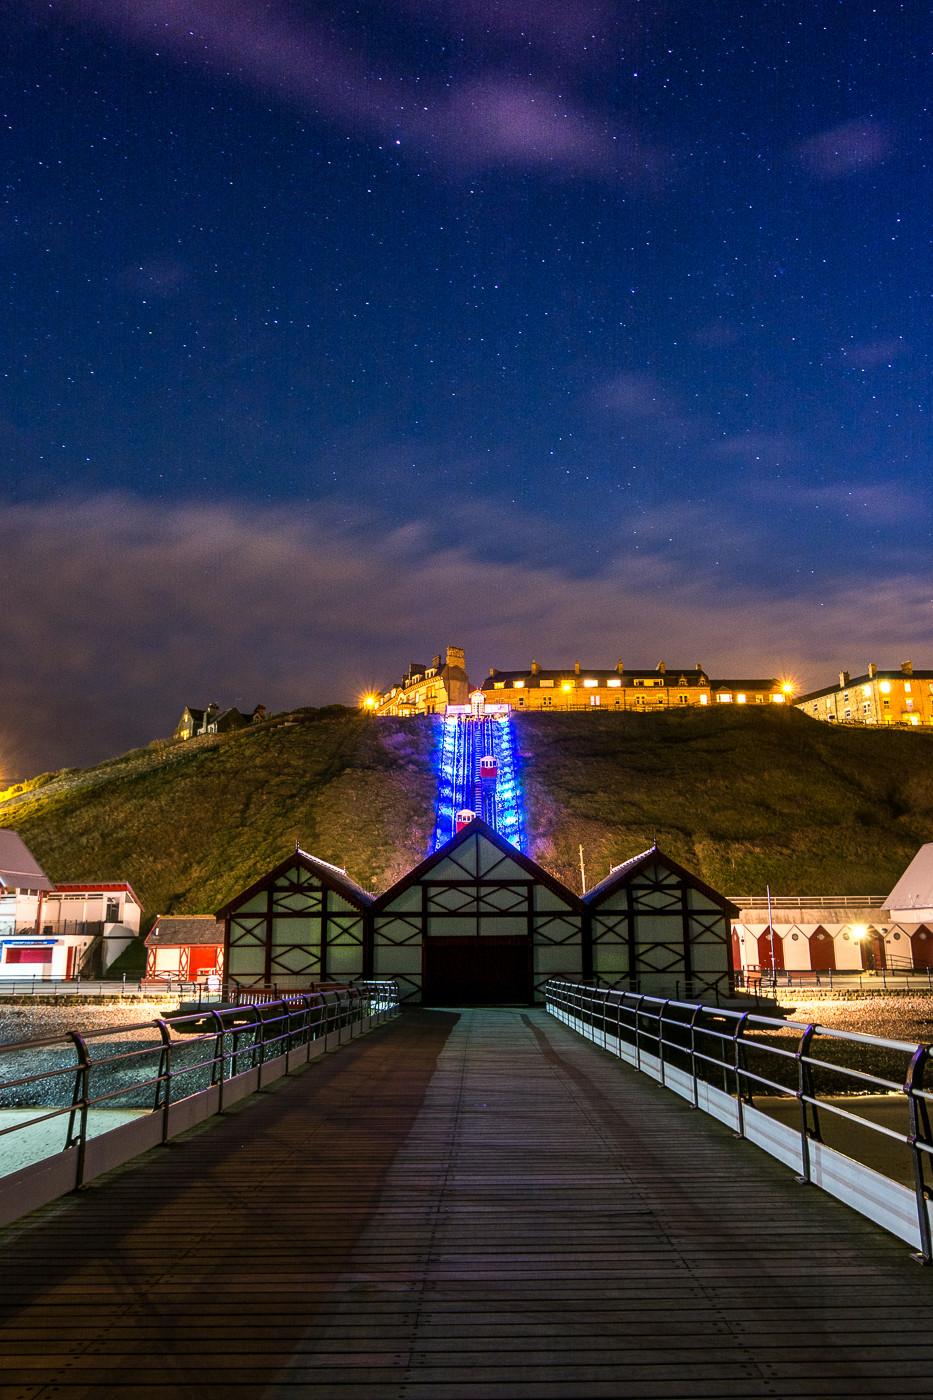 Saltburn Pier UK astrophotography